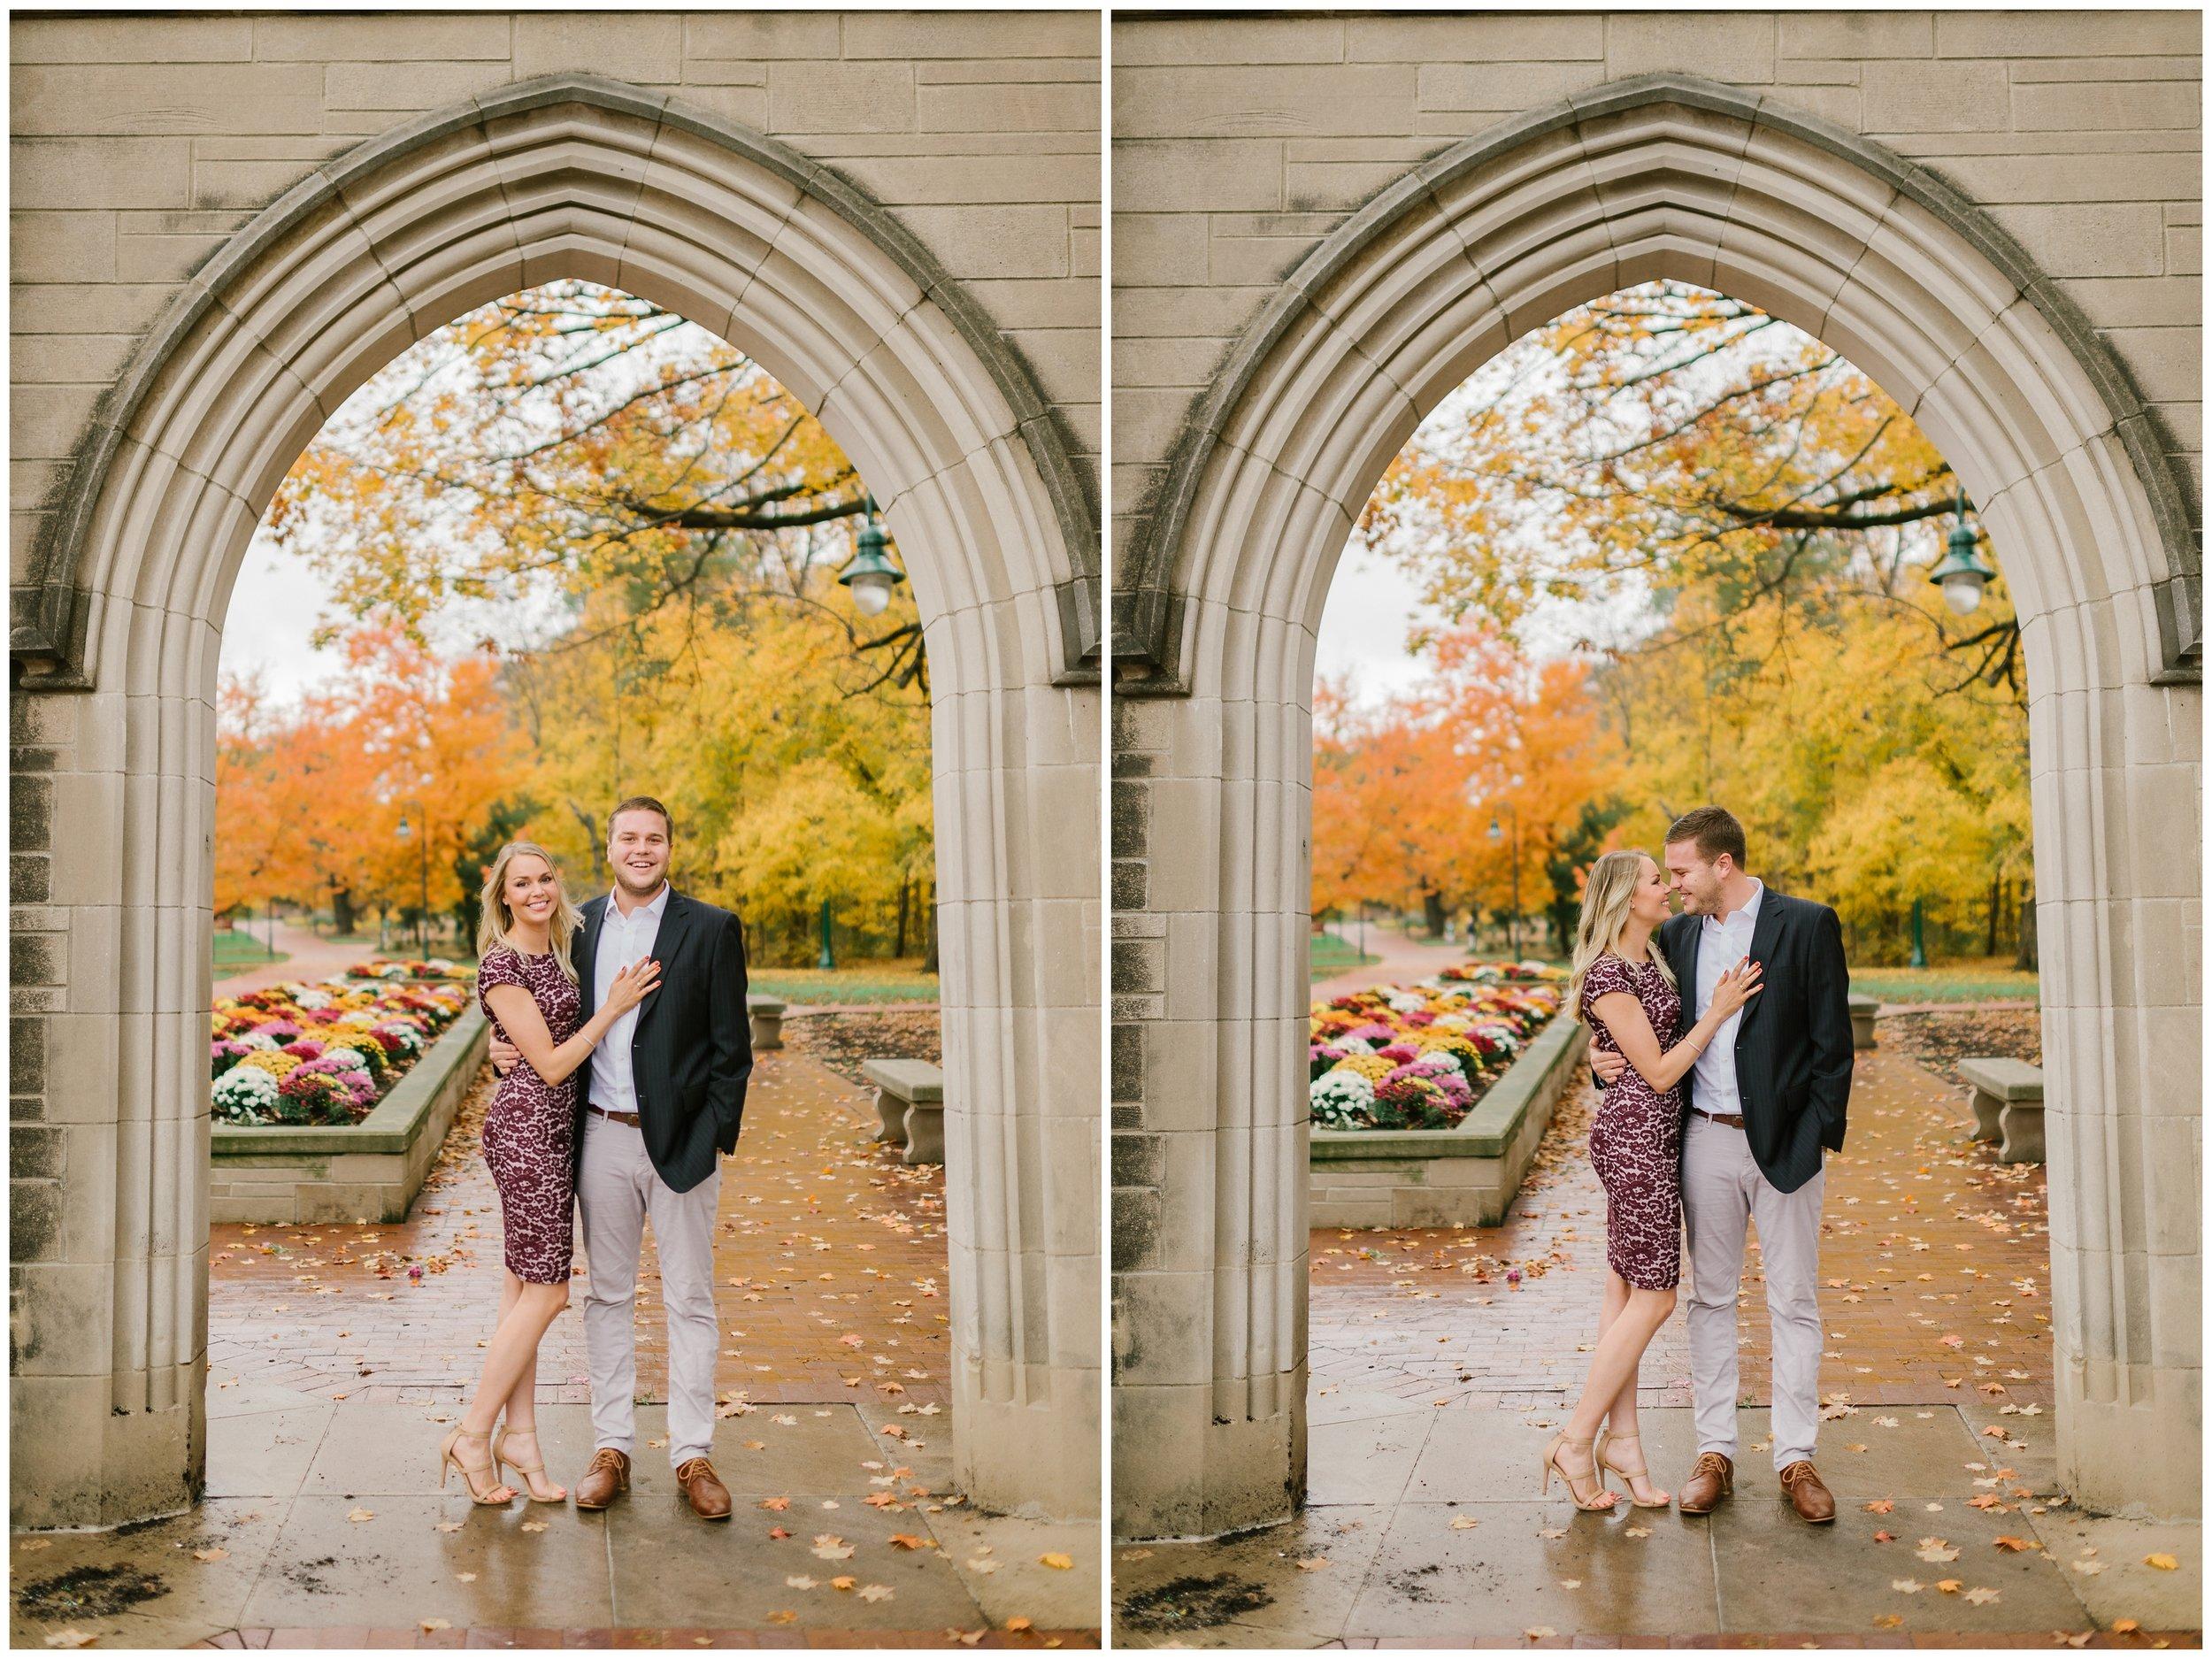 Rebecca_Shehorn_Photography_Indianapolis_Wedding_Photographer_7674.jpg